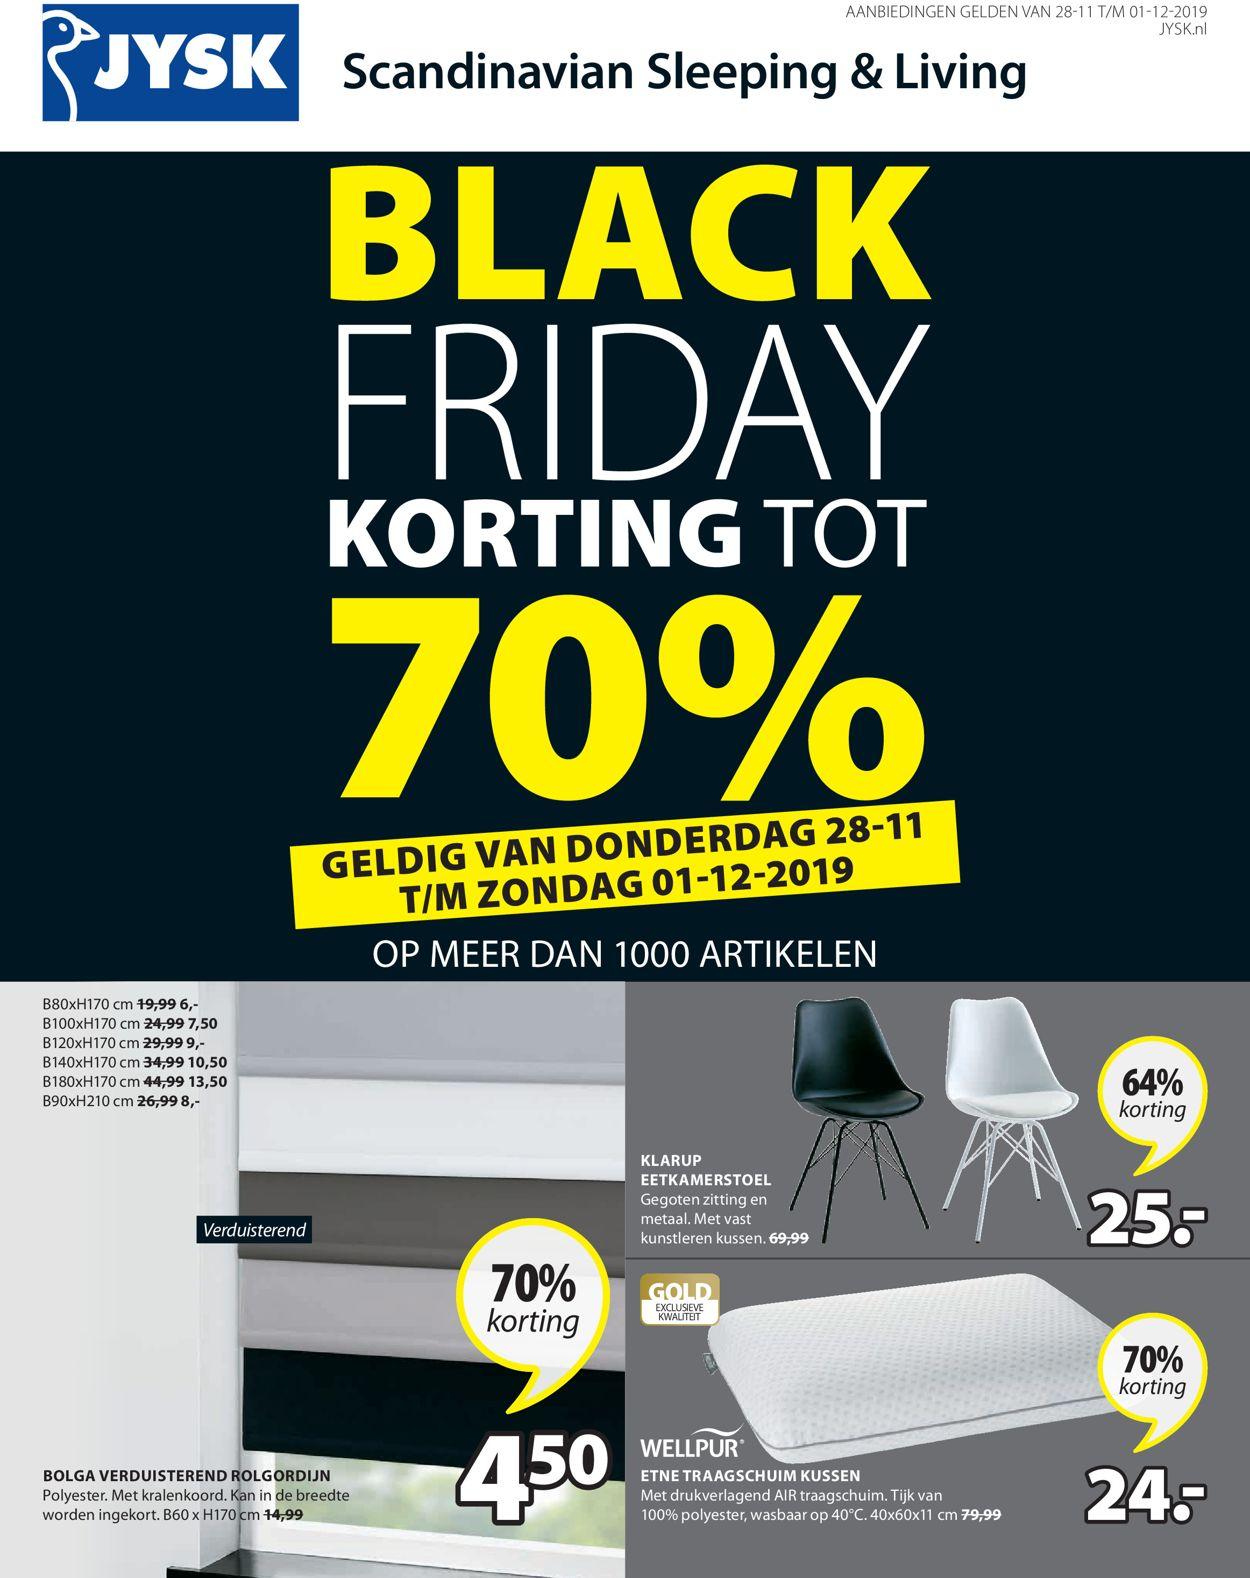 JYSK Black Friday 2019 Folder - 28.11-01.12.2019